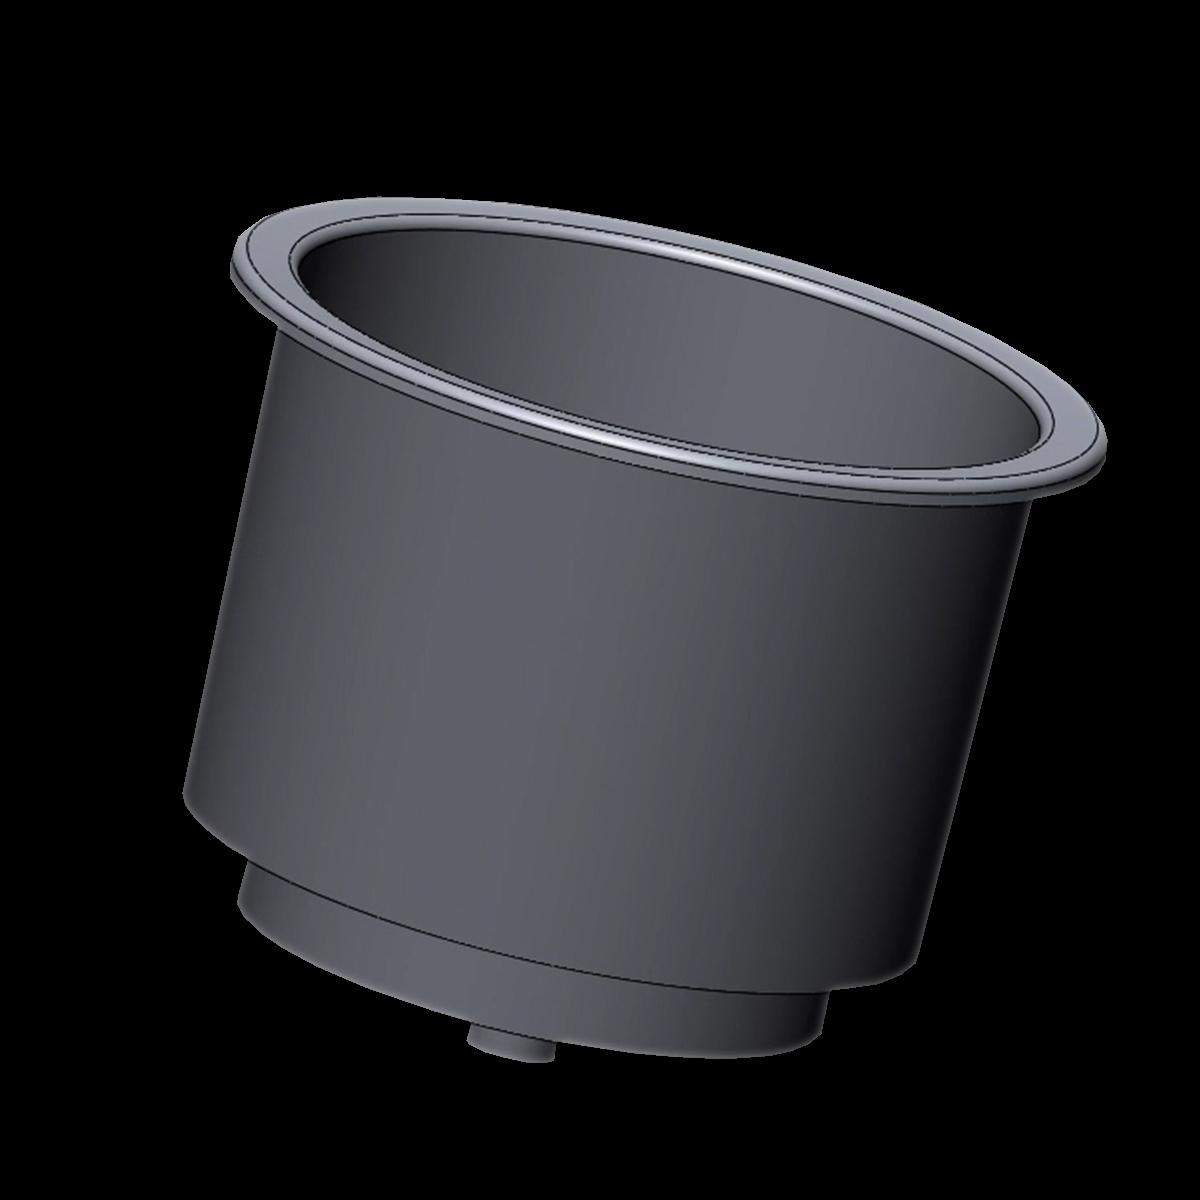 CAD modeling service, 3D rendering, reverse engineering